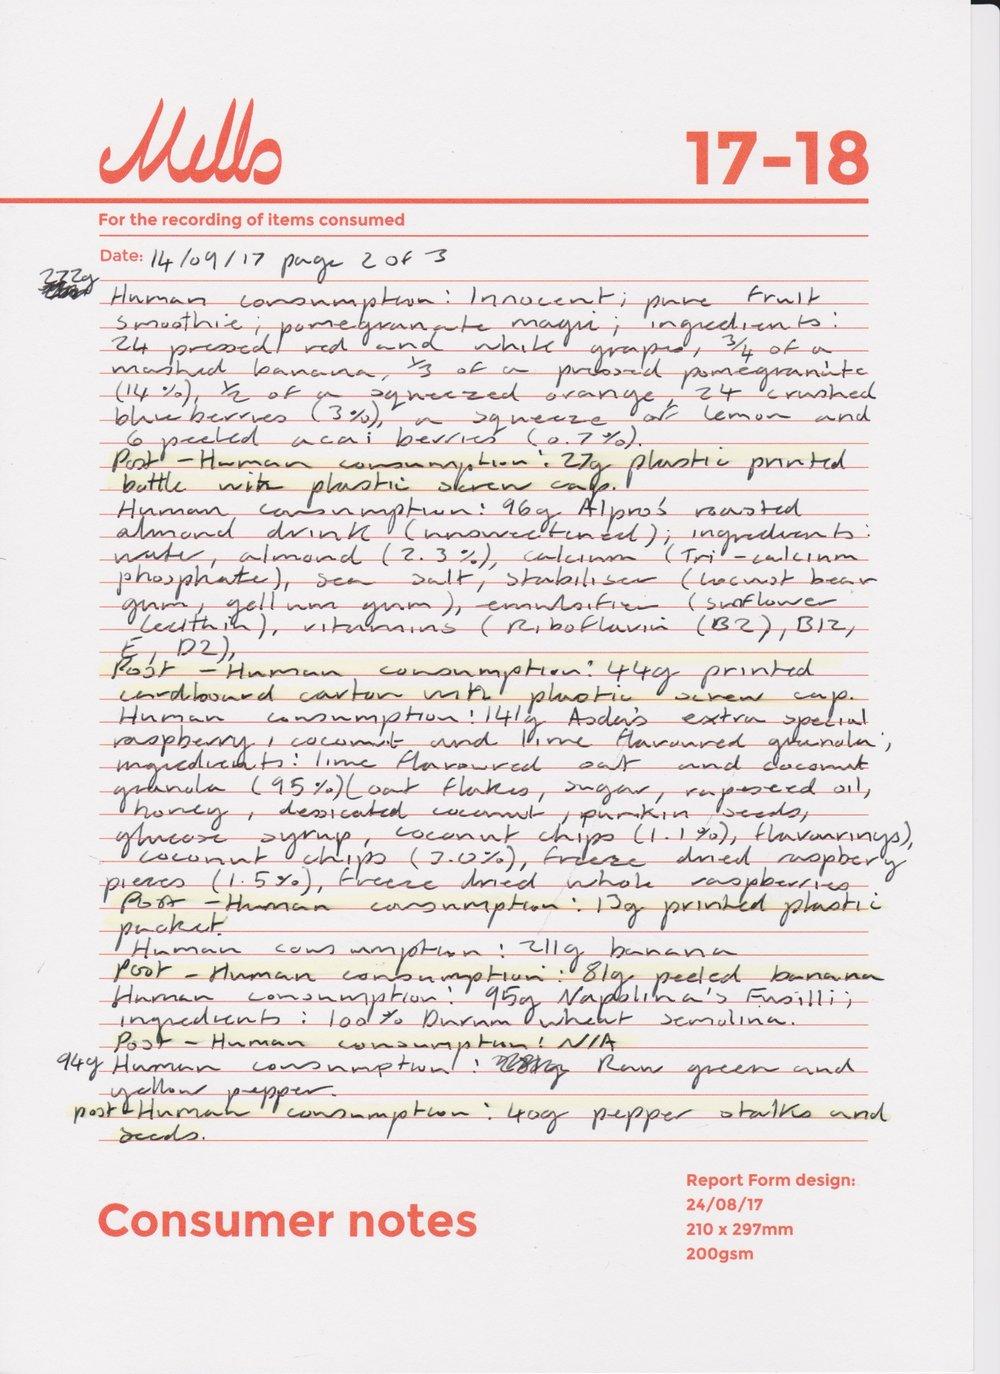 Steven Mills Consumer notes 140917 pg2 of 3.jpeg